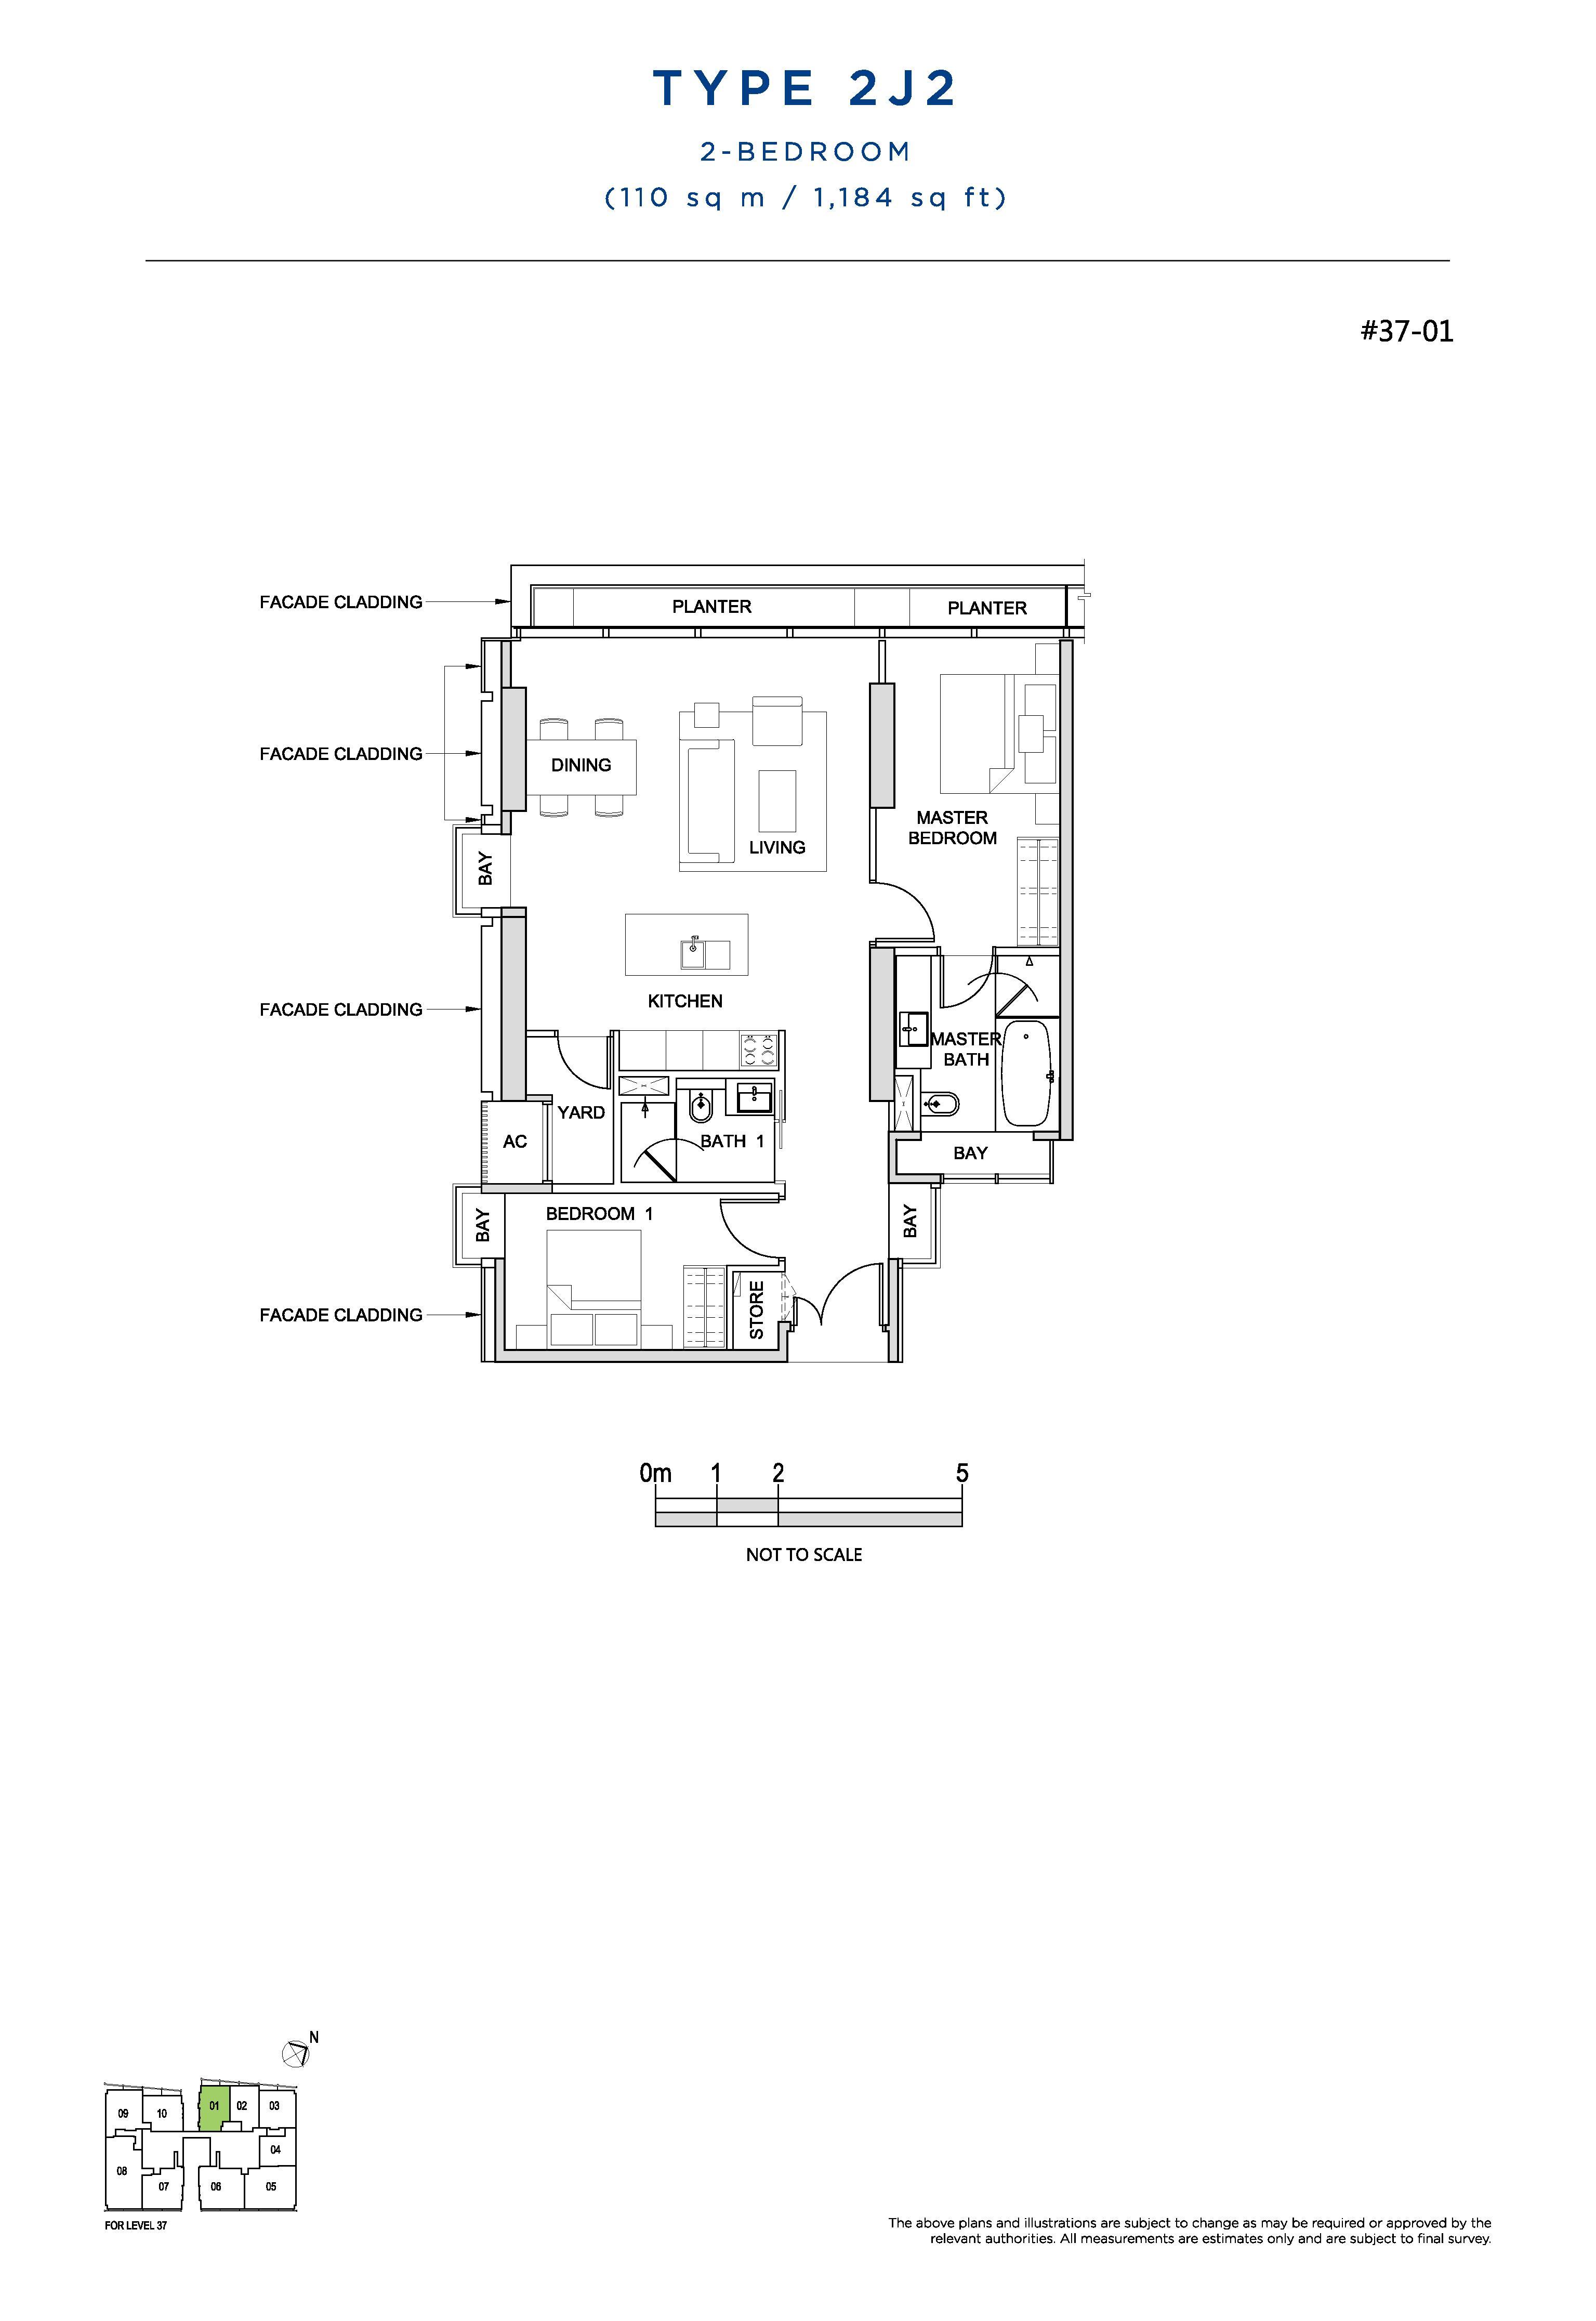 South Beach Residences 2 Bedroom Floor Plans Type 2J2